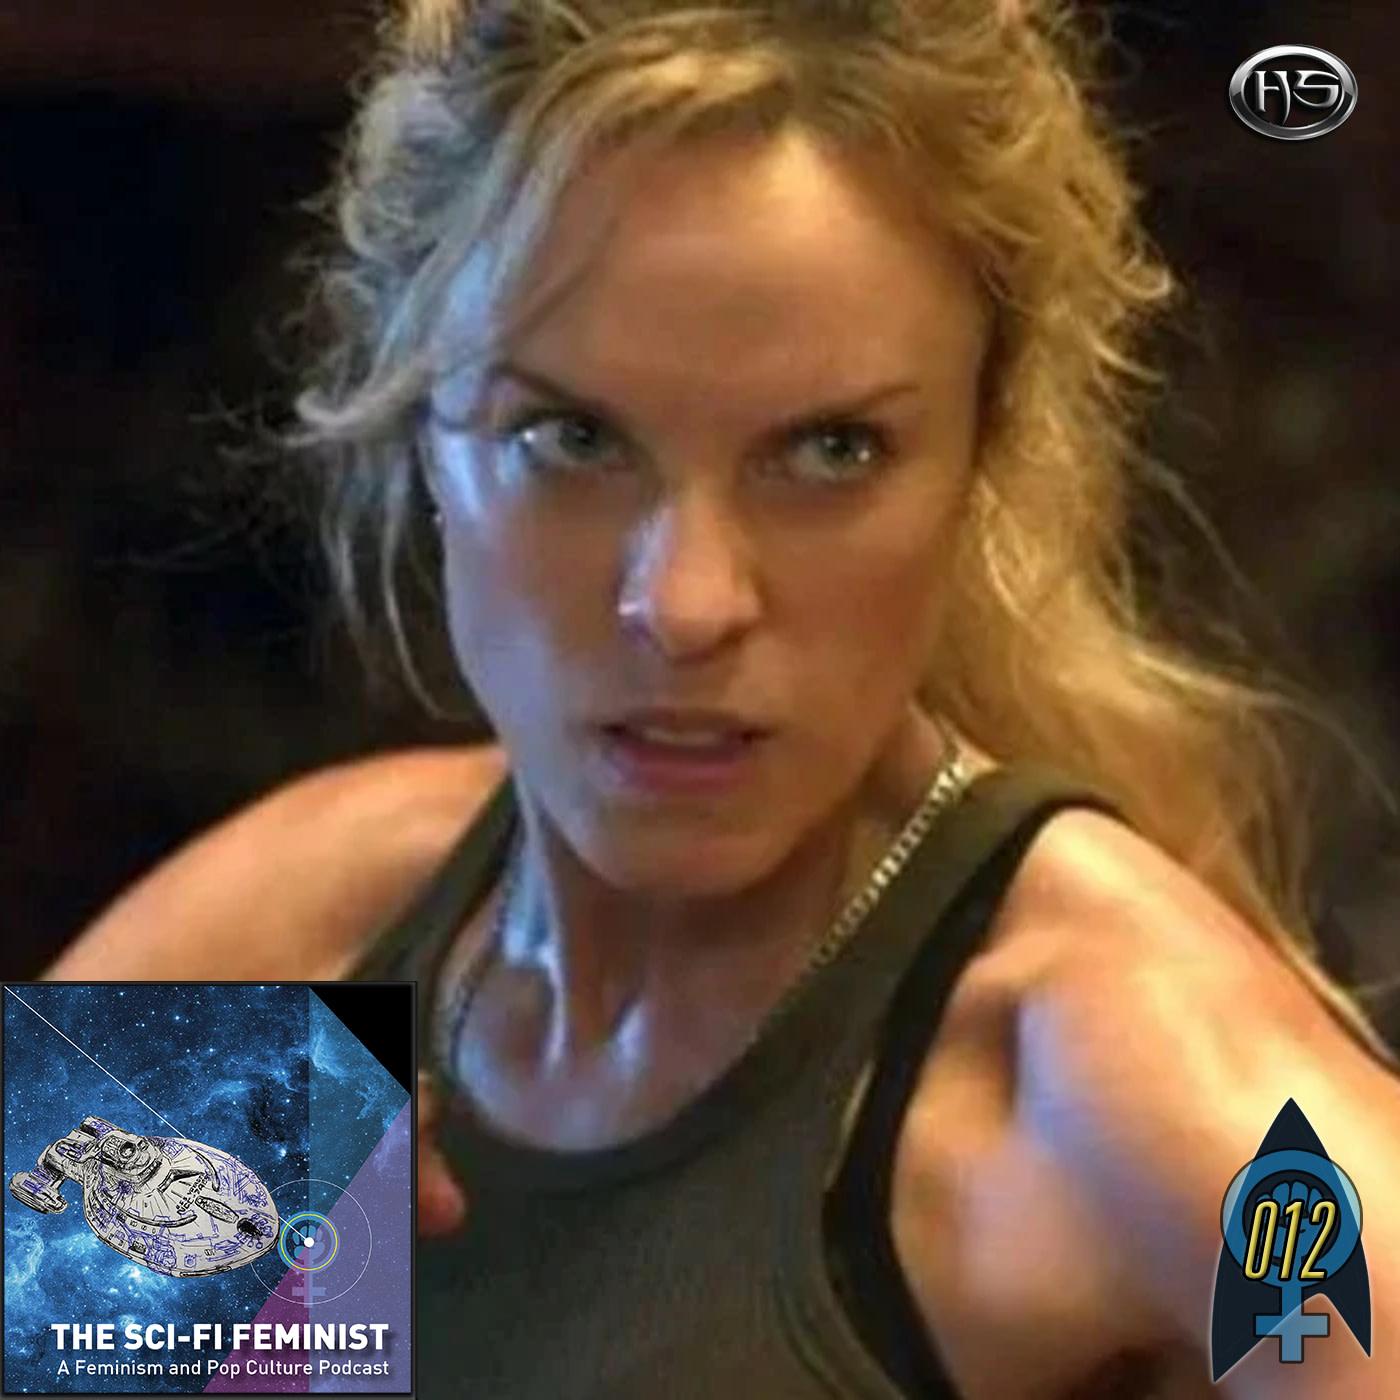 The Sci-Fi Feminist Episode 12